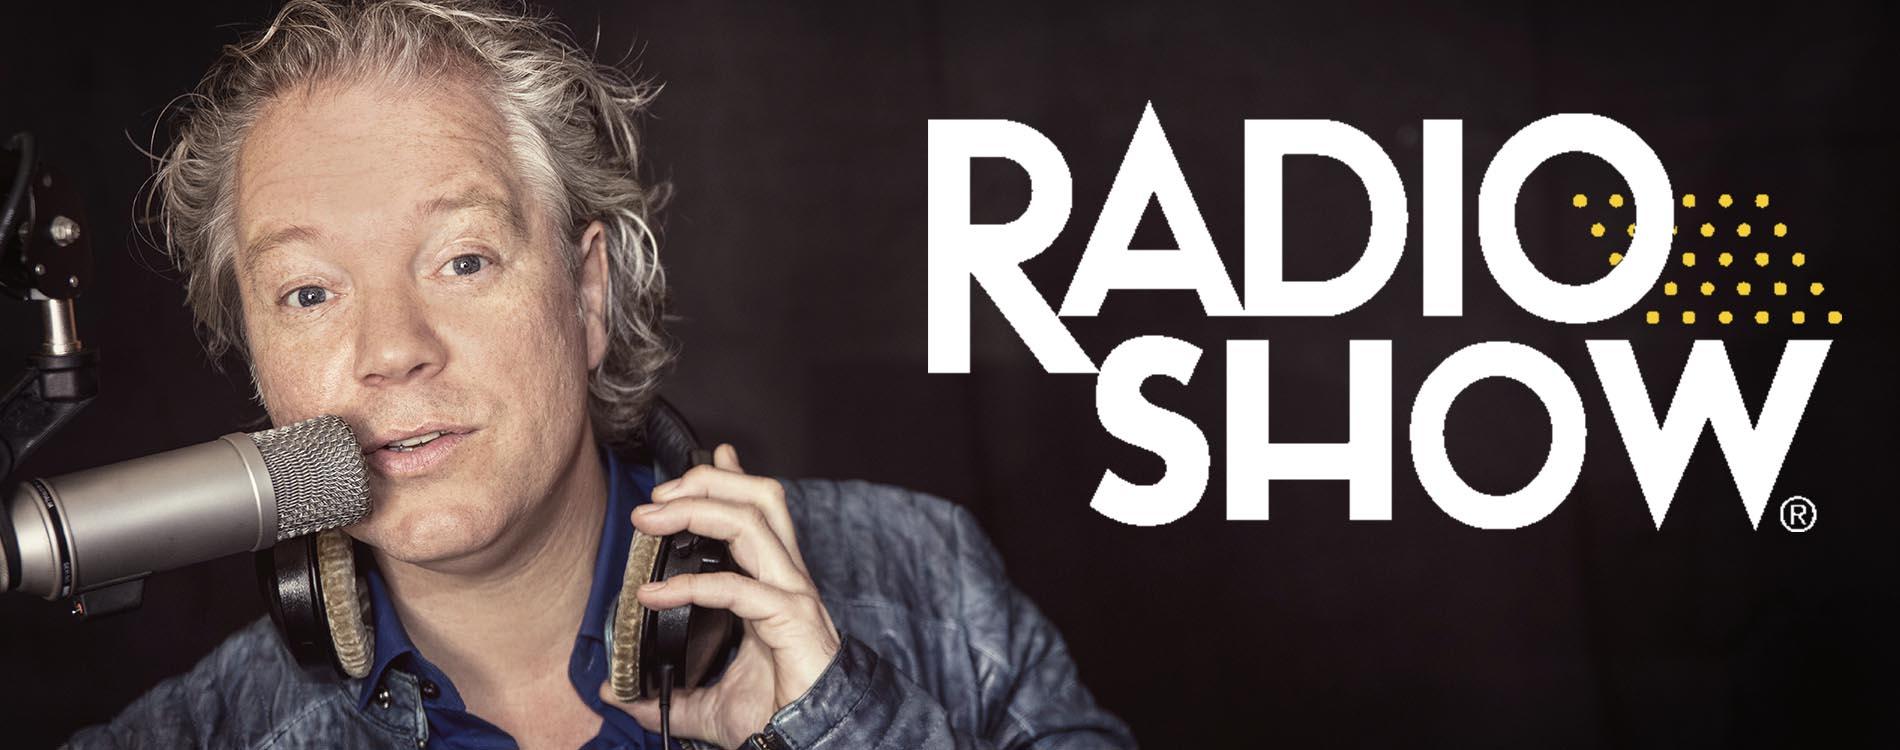 Radio Show header